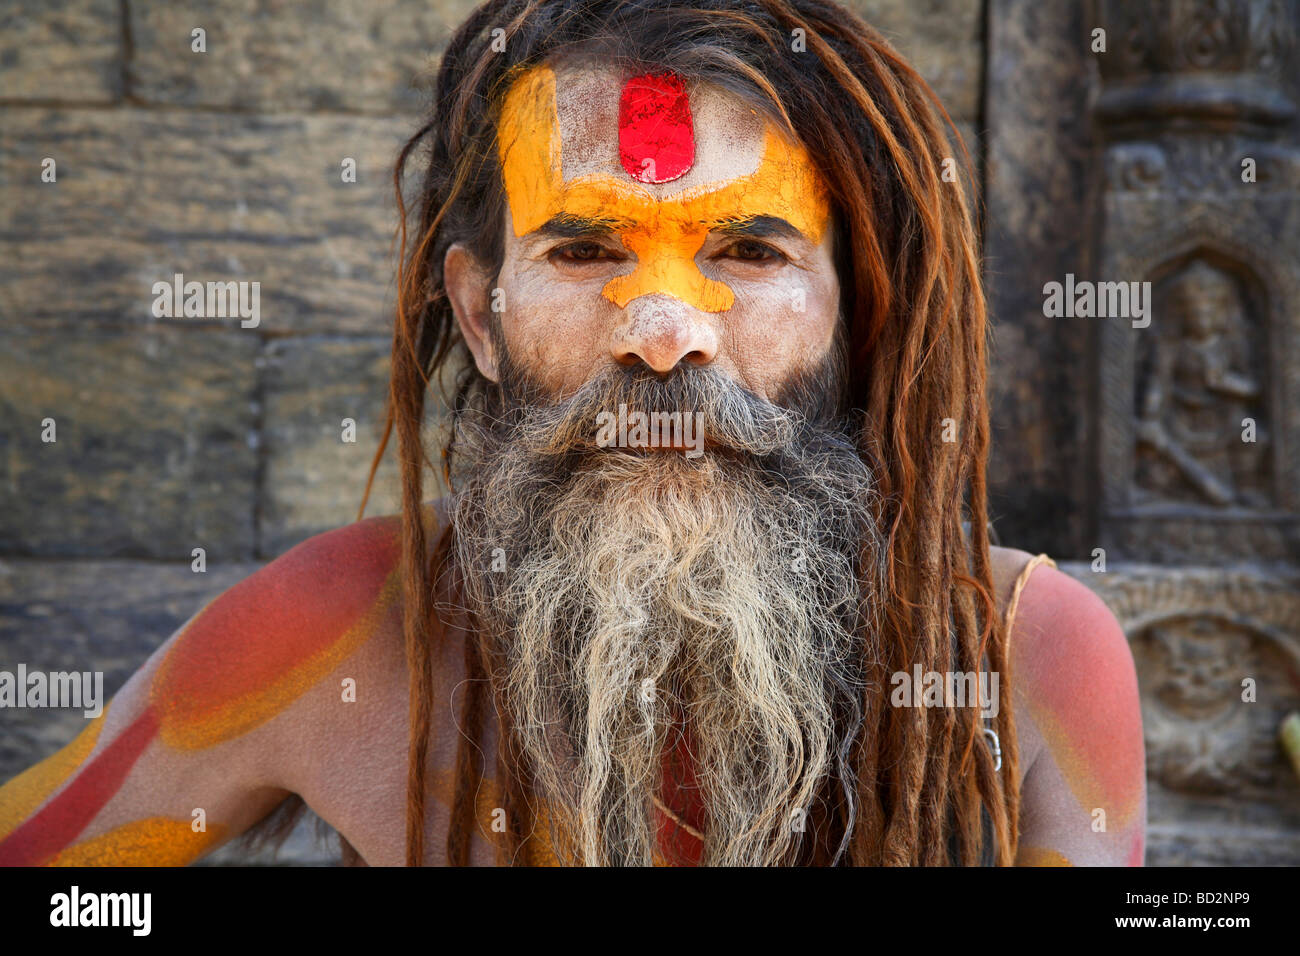 Una cara pintada de un sadhu Imagen De Stock